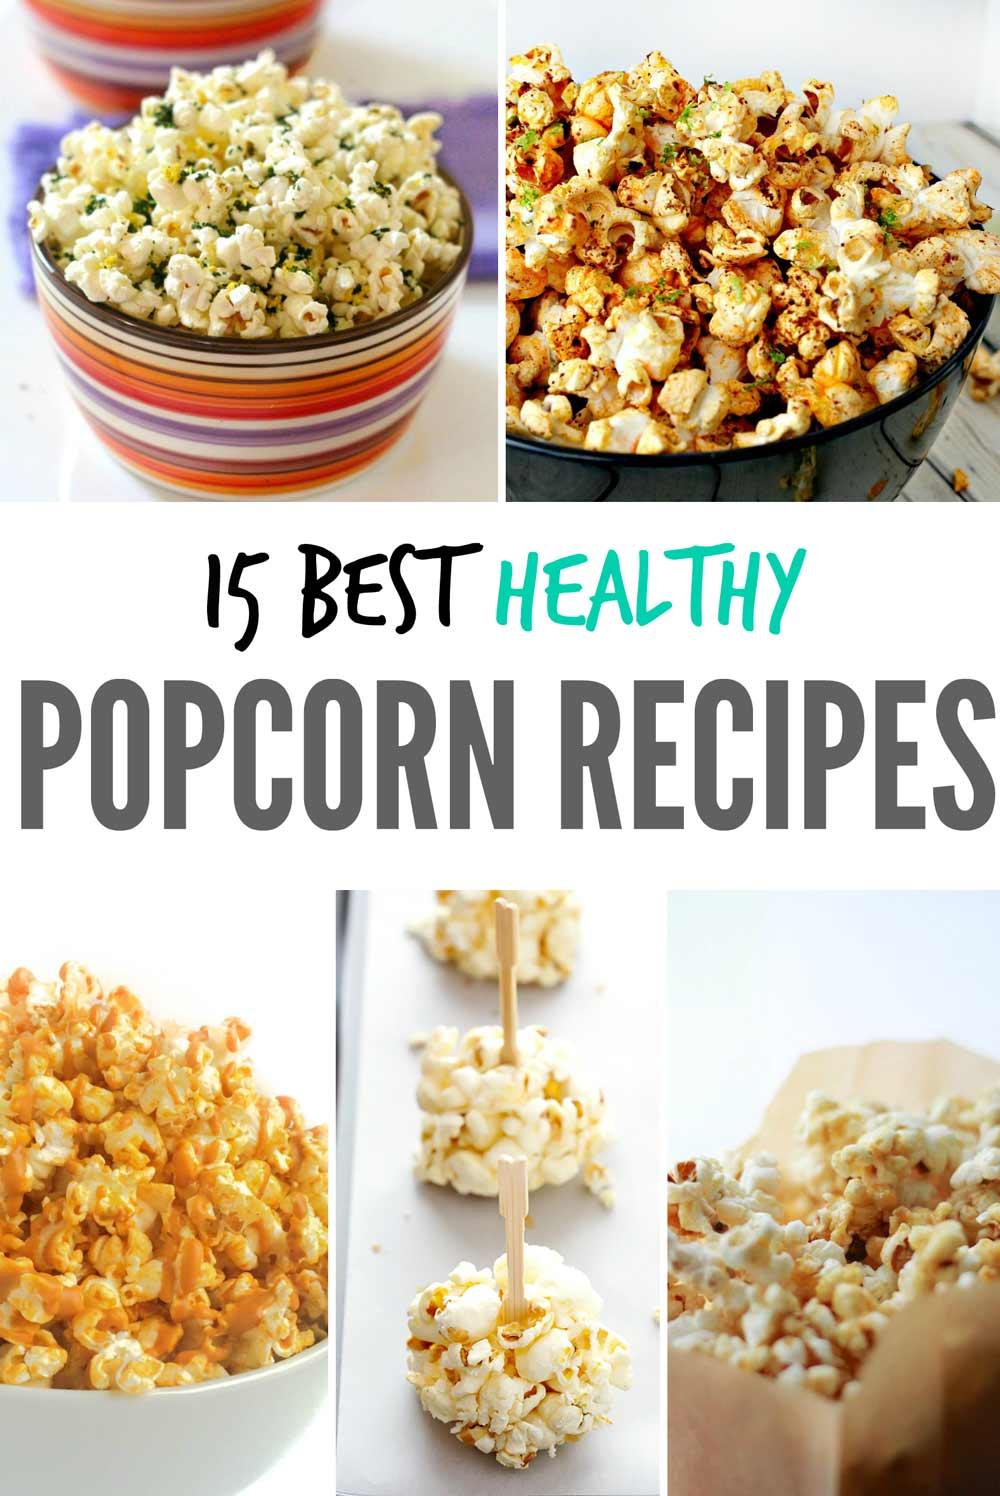 15 Healthy Popcorn Recipes